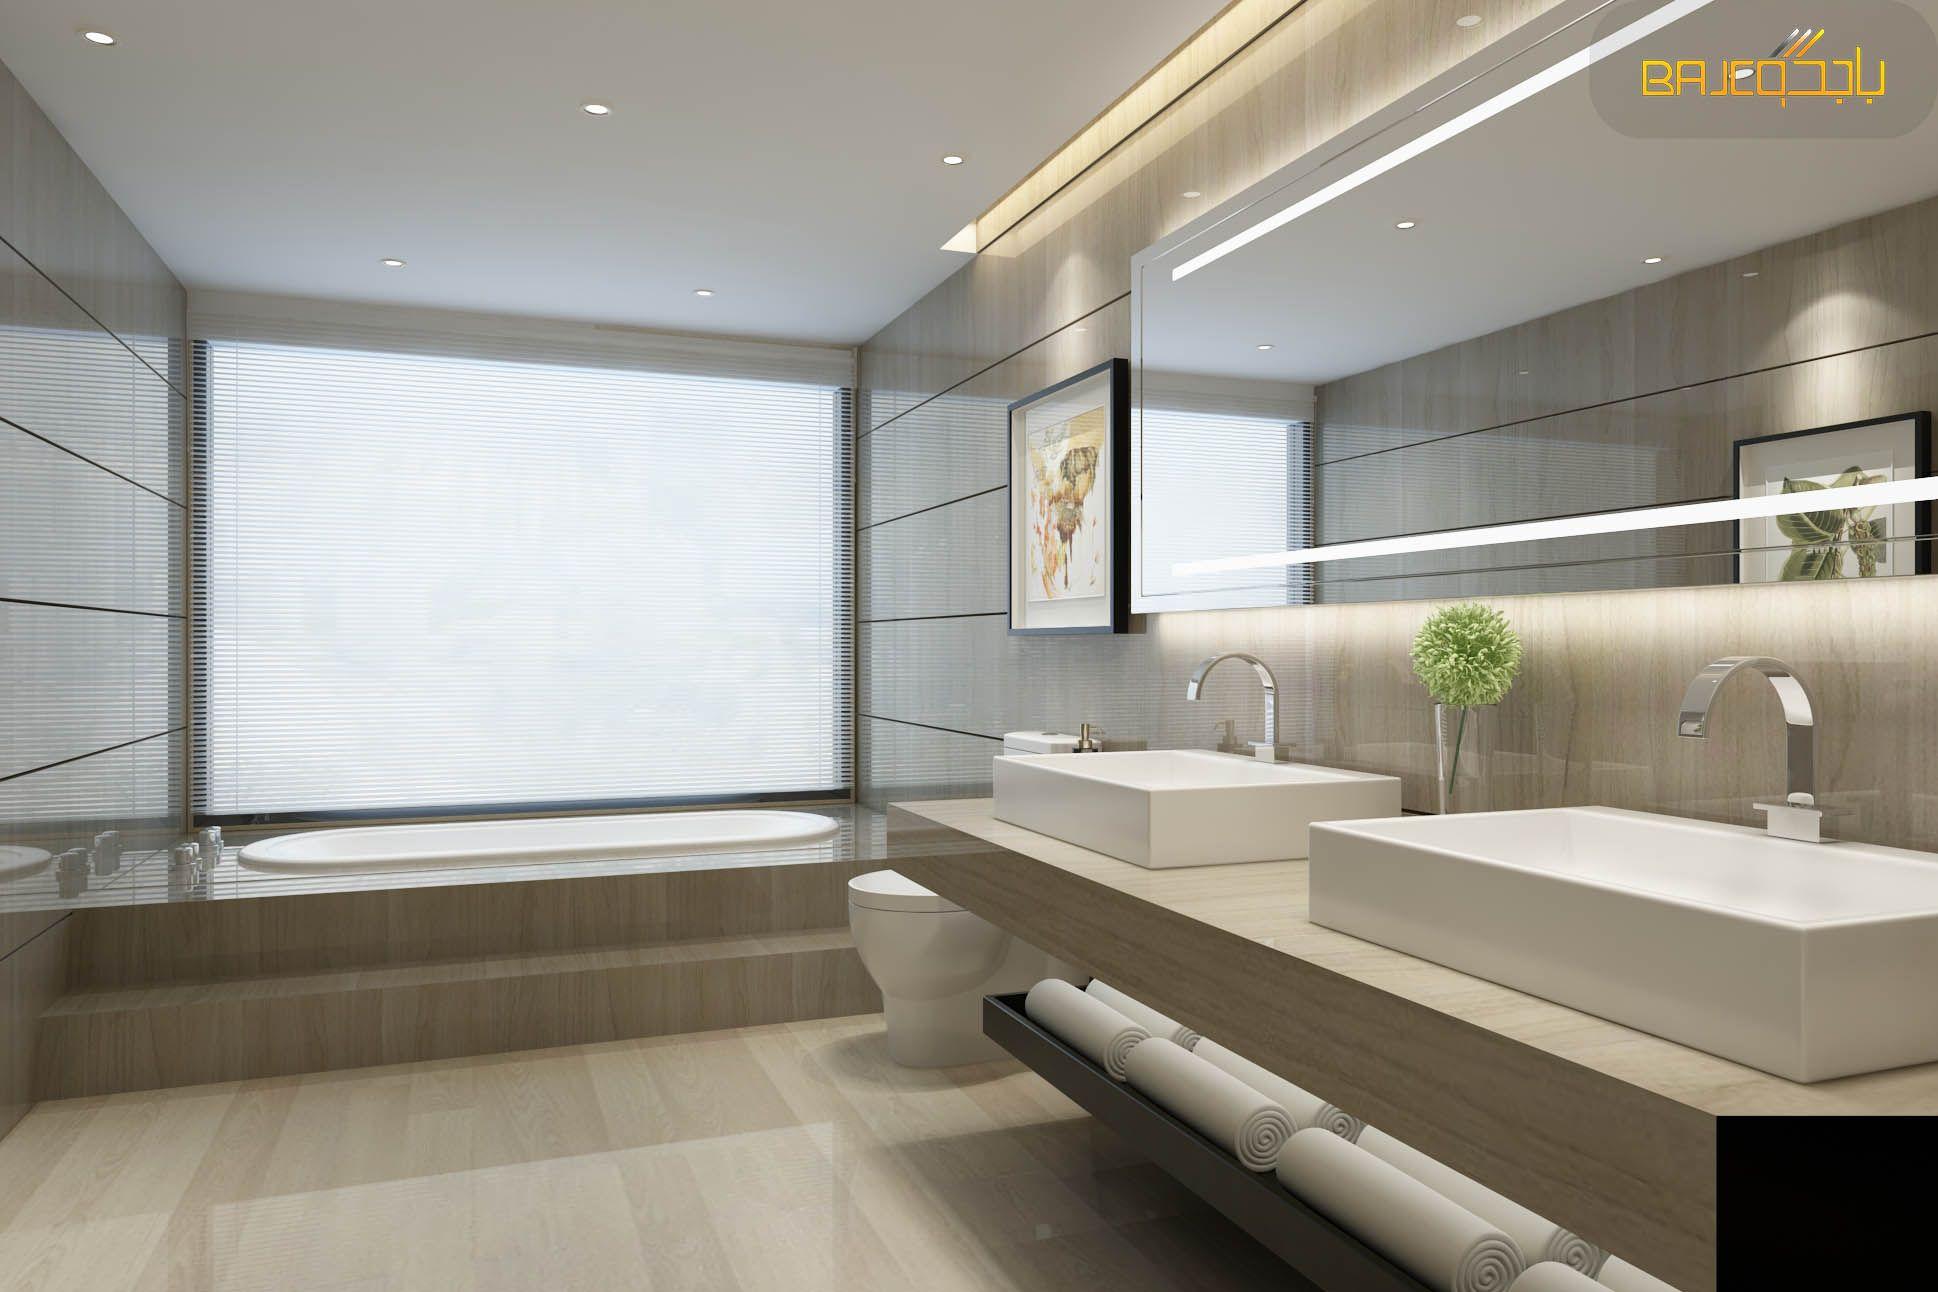 مغاسل كريم مارفل Lighted Bathroom Mirror Bathroom Mirror Bathroom Lighting